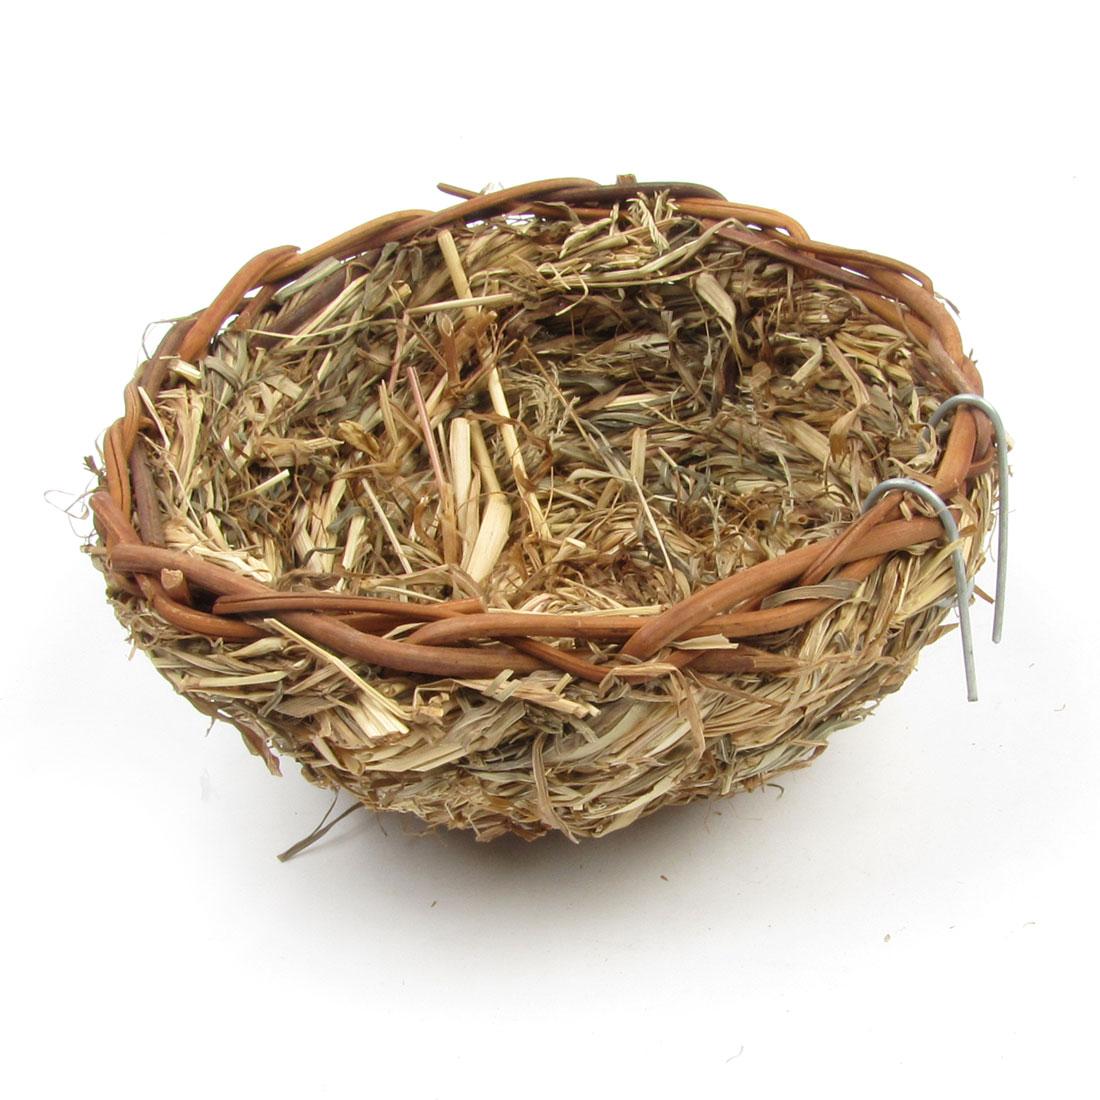 Natural Grass Bowl Shaped Bird Eggs Holder Birdhouse Living House Artificial Nest